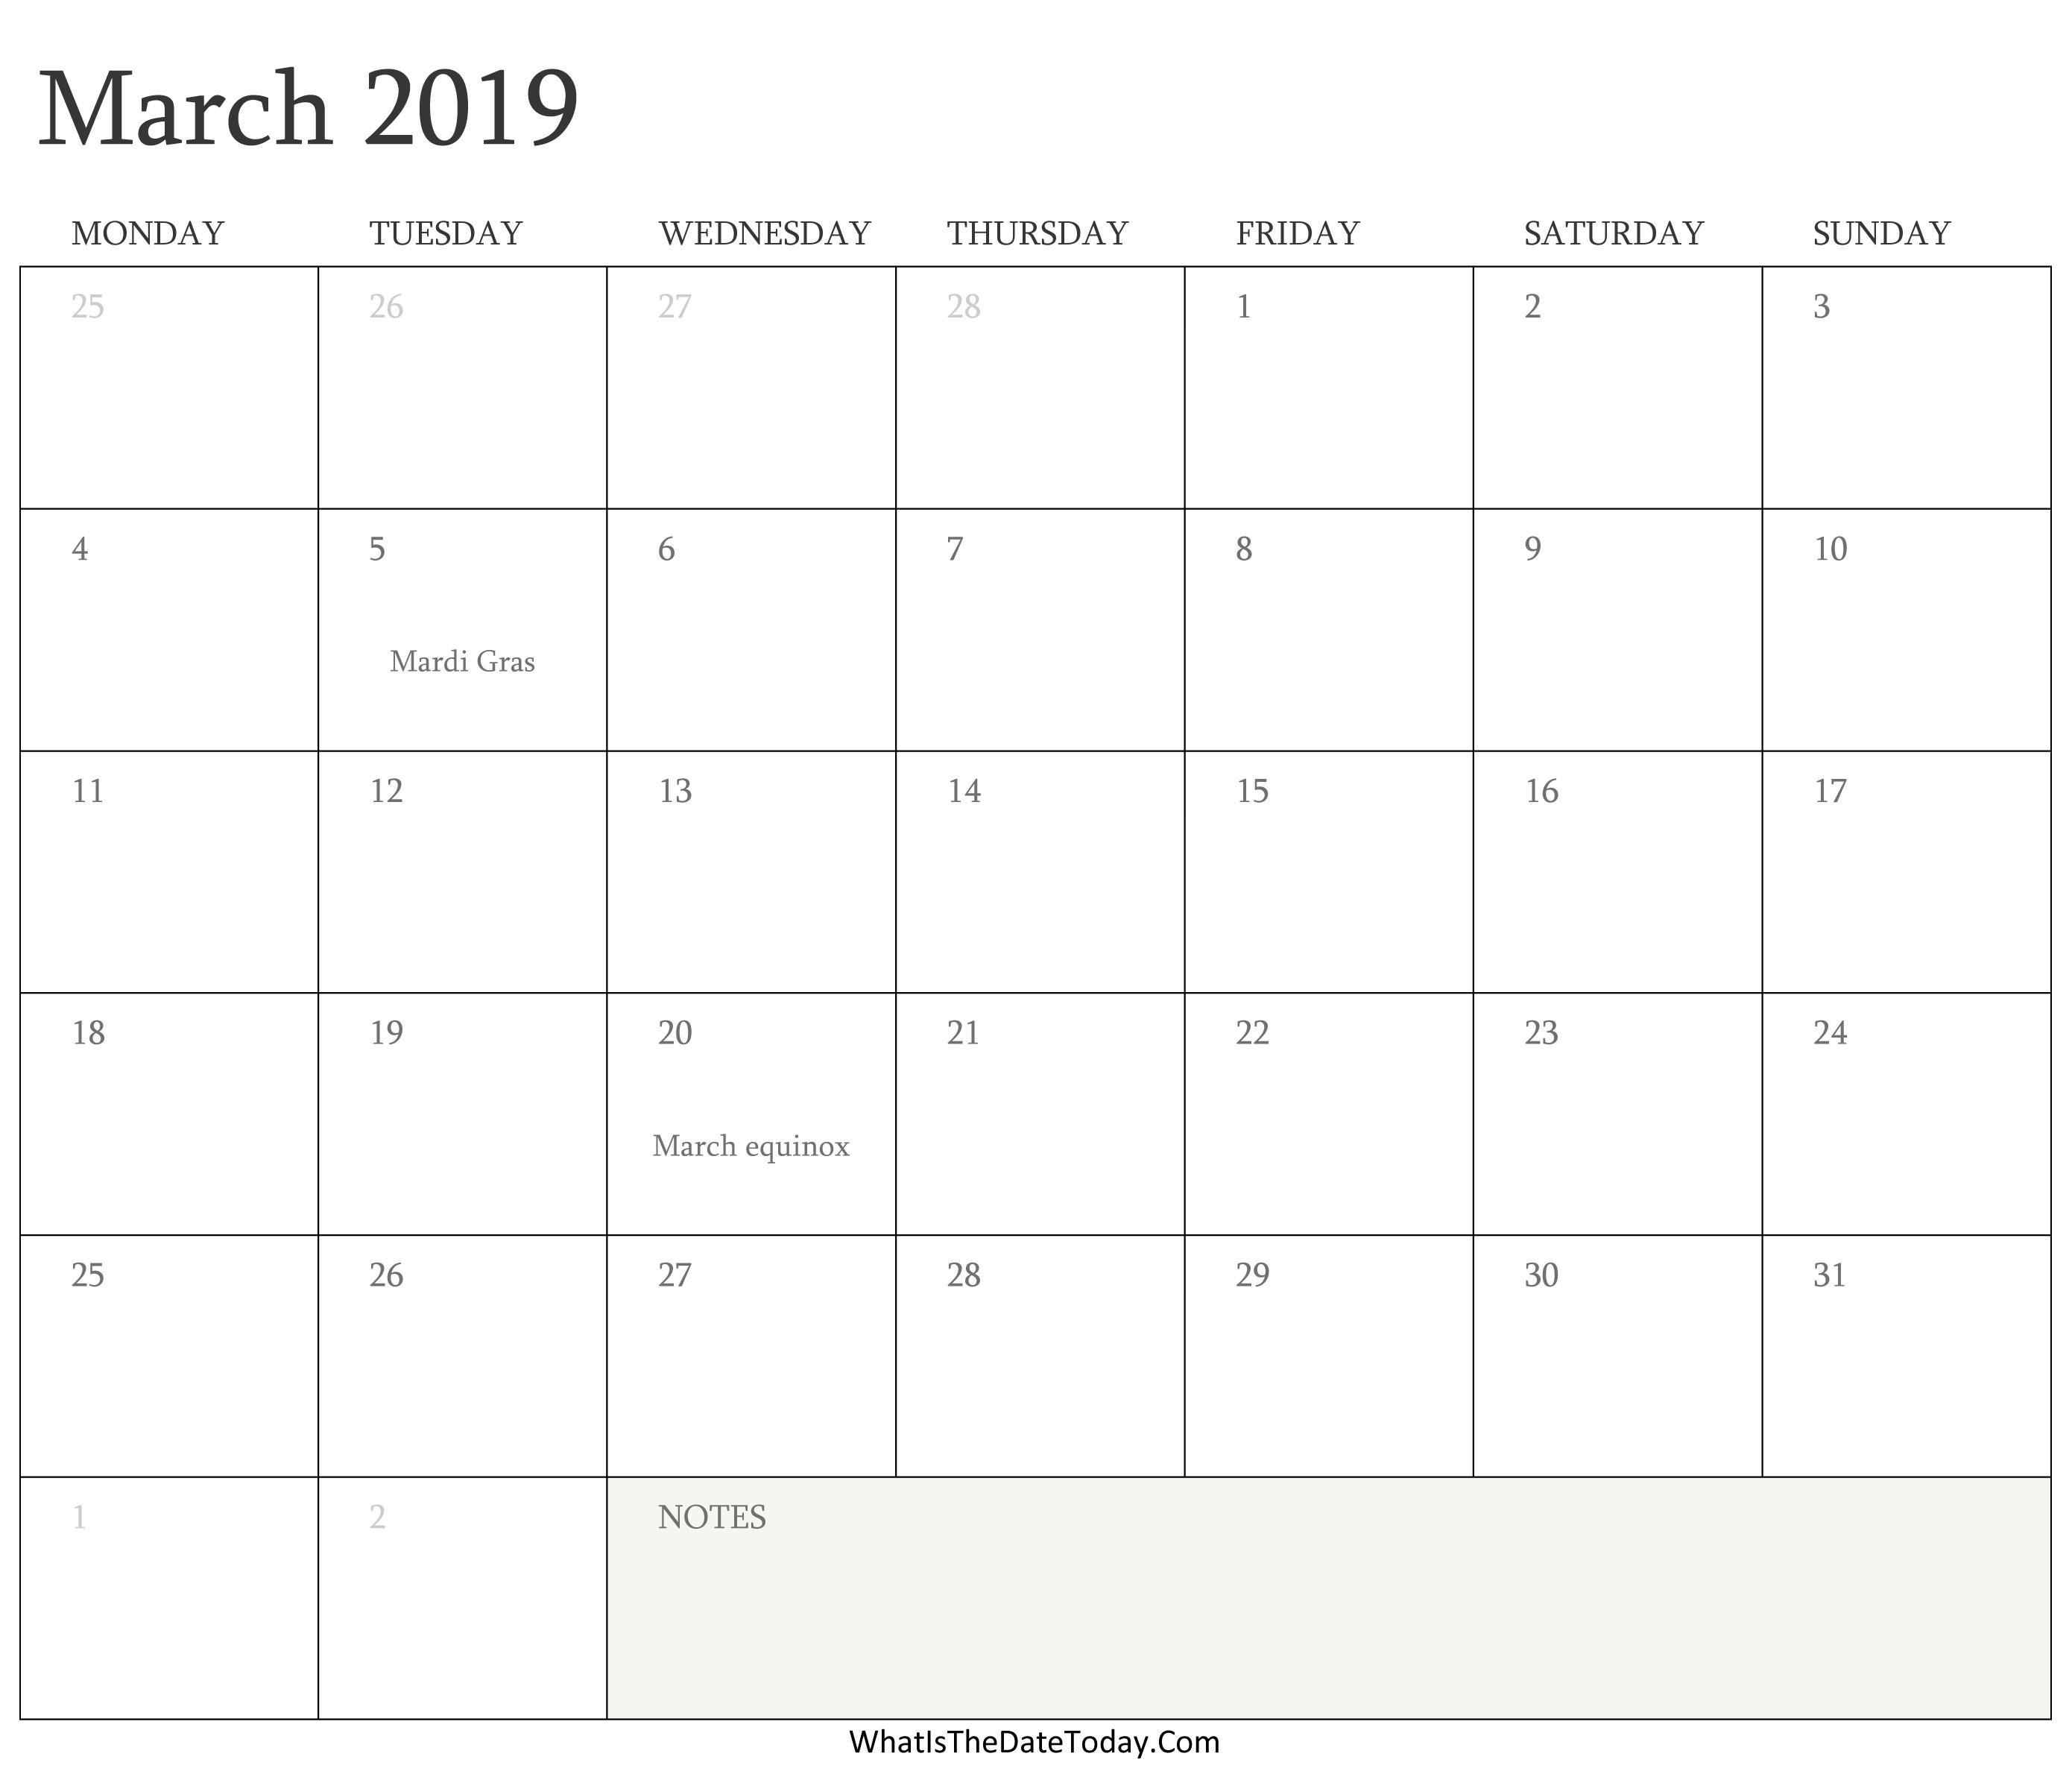 March Holiday Calendar 2019 Más Populares Editable Calendar March 2019 with Holidays Of March Holiday Calendar 2019 Más Caliente Printable March 2019 Calendar Template Holidays Yes Calendars